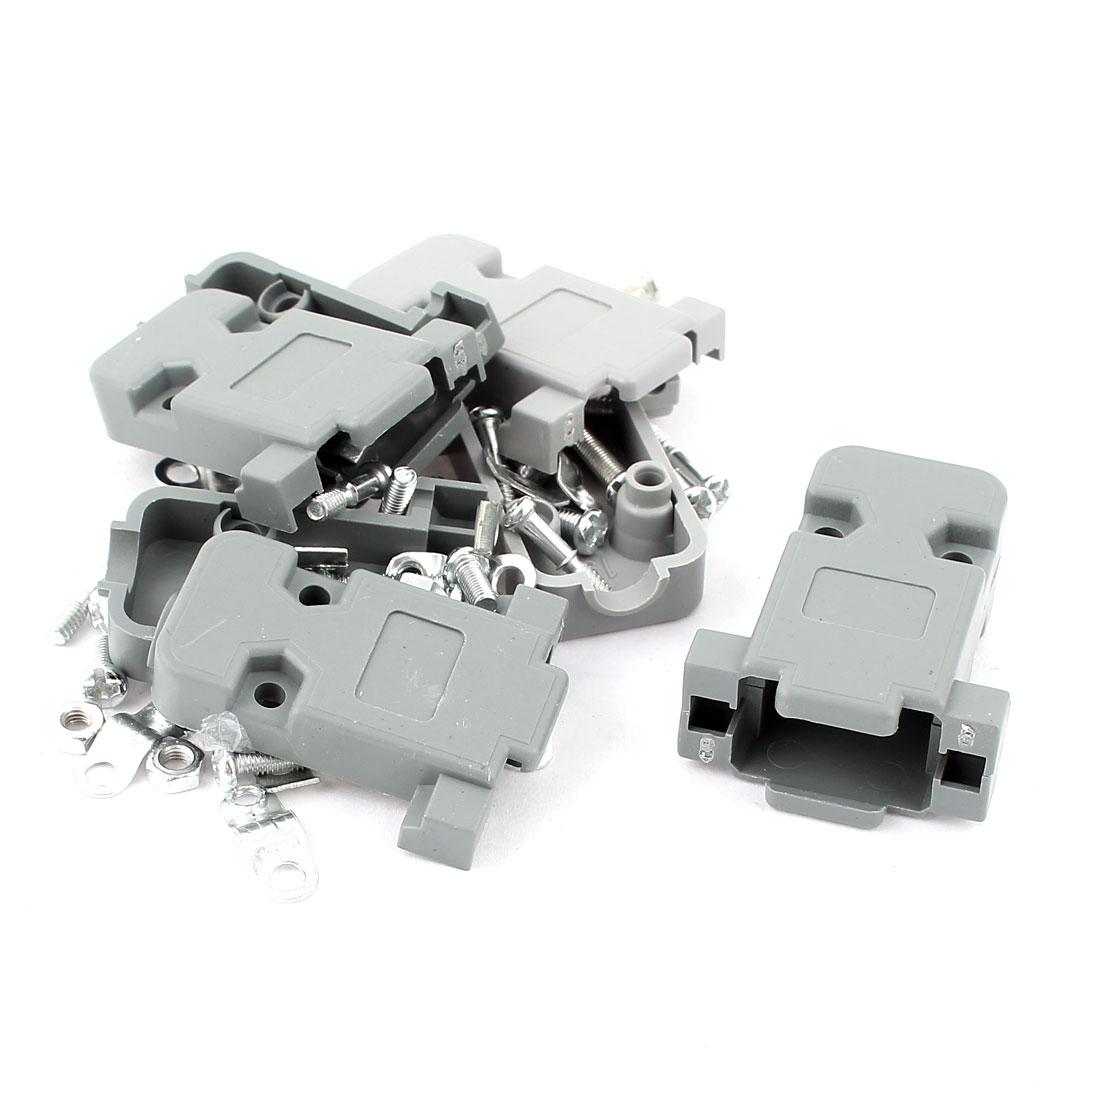 Gray Plastic DB9 9 Pins D-SUB Female Connector Hood Cover Protection Cap 4pcs